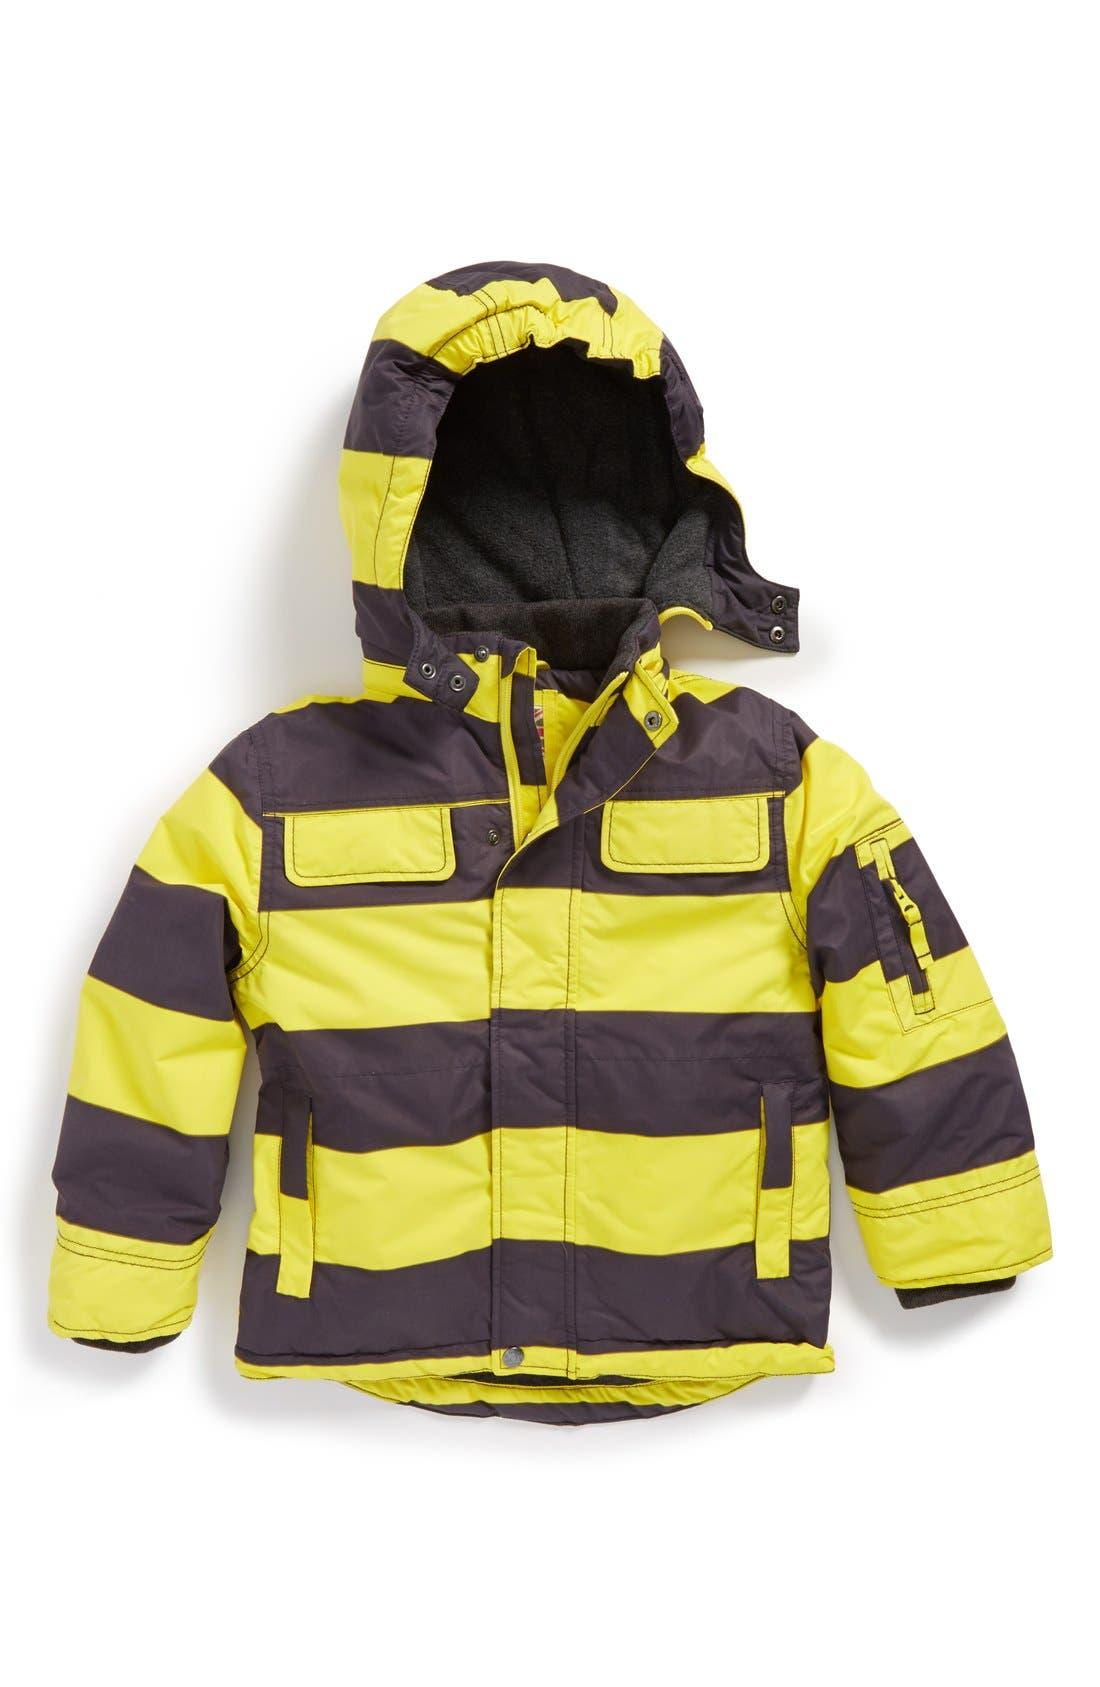 Main Image - Mini Boden 'Snowboard' Waterproof Jacket (Toddler Boys, Little Boys & Big Boys)